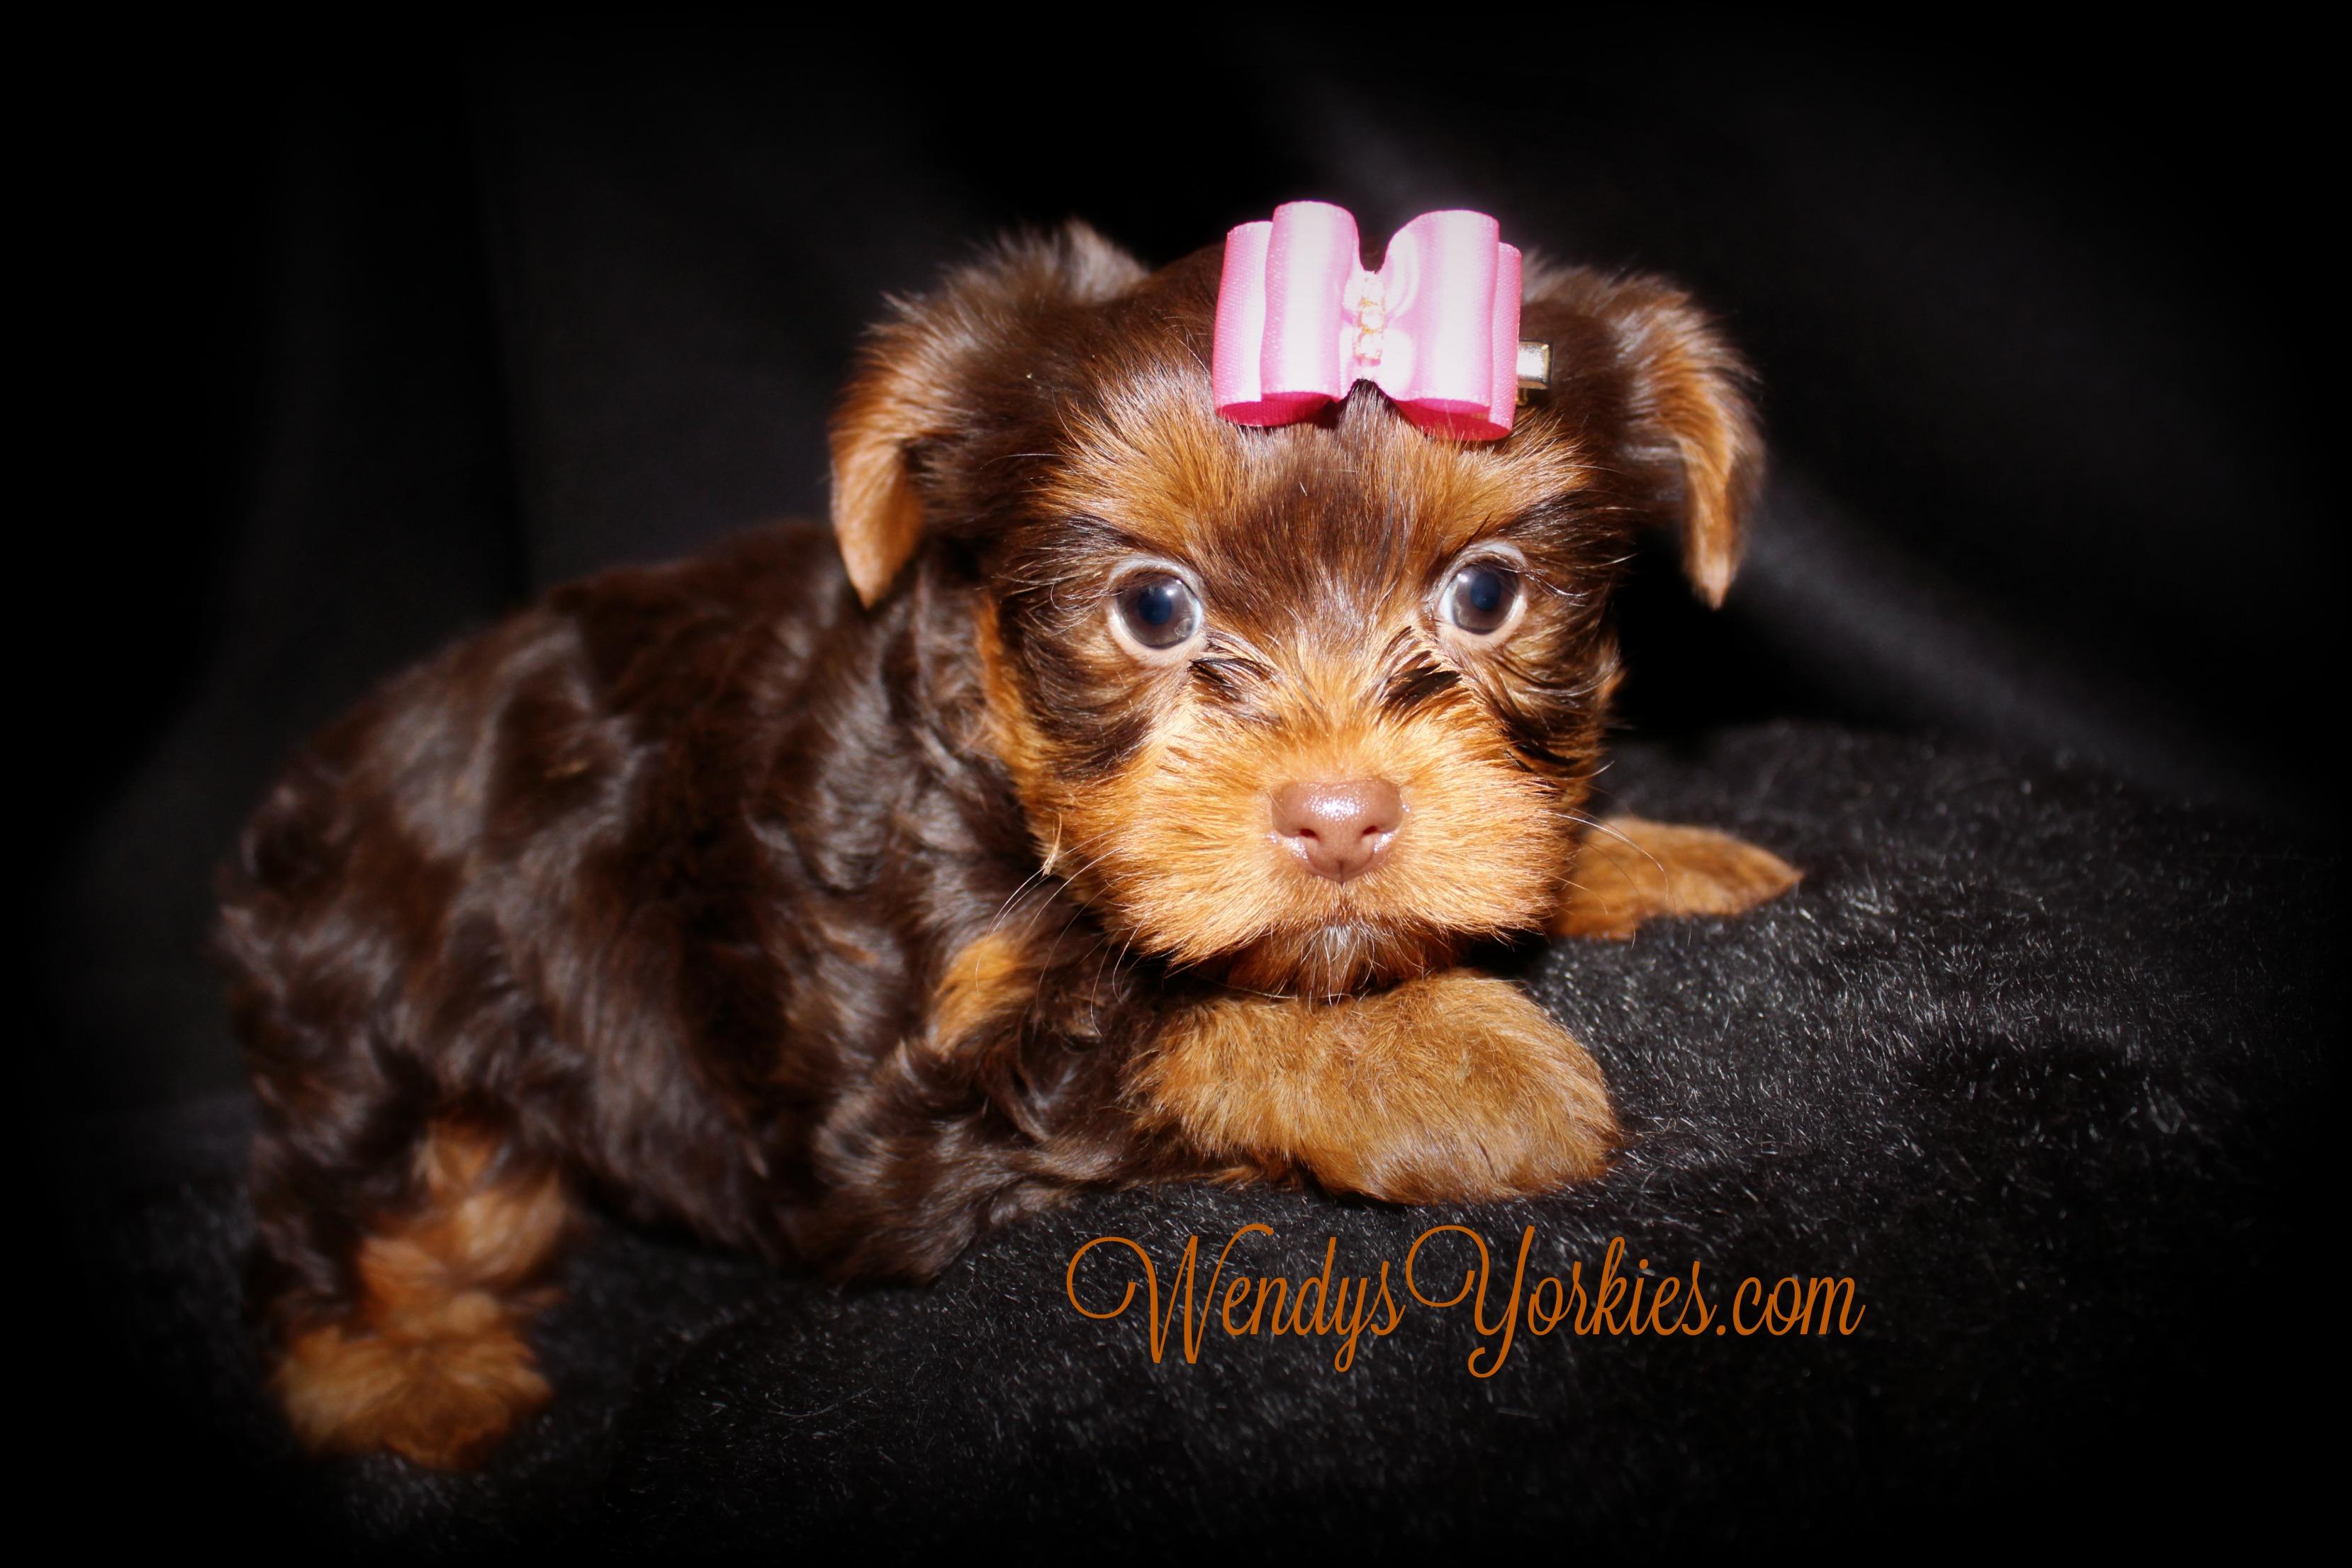 Tiny Chocolate Yorkie puppies for sale, WendysYorkies.com, Lela fc1